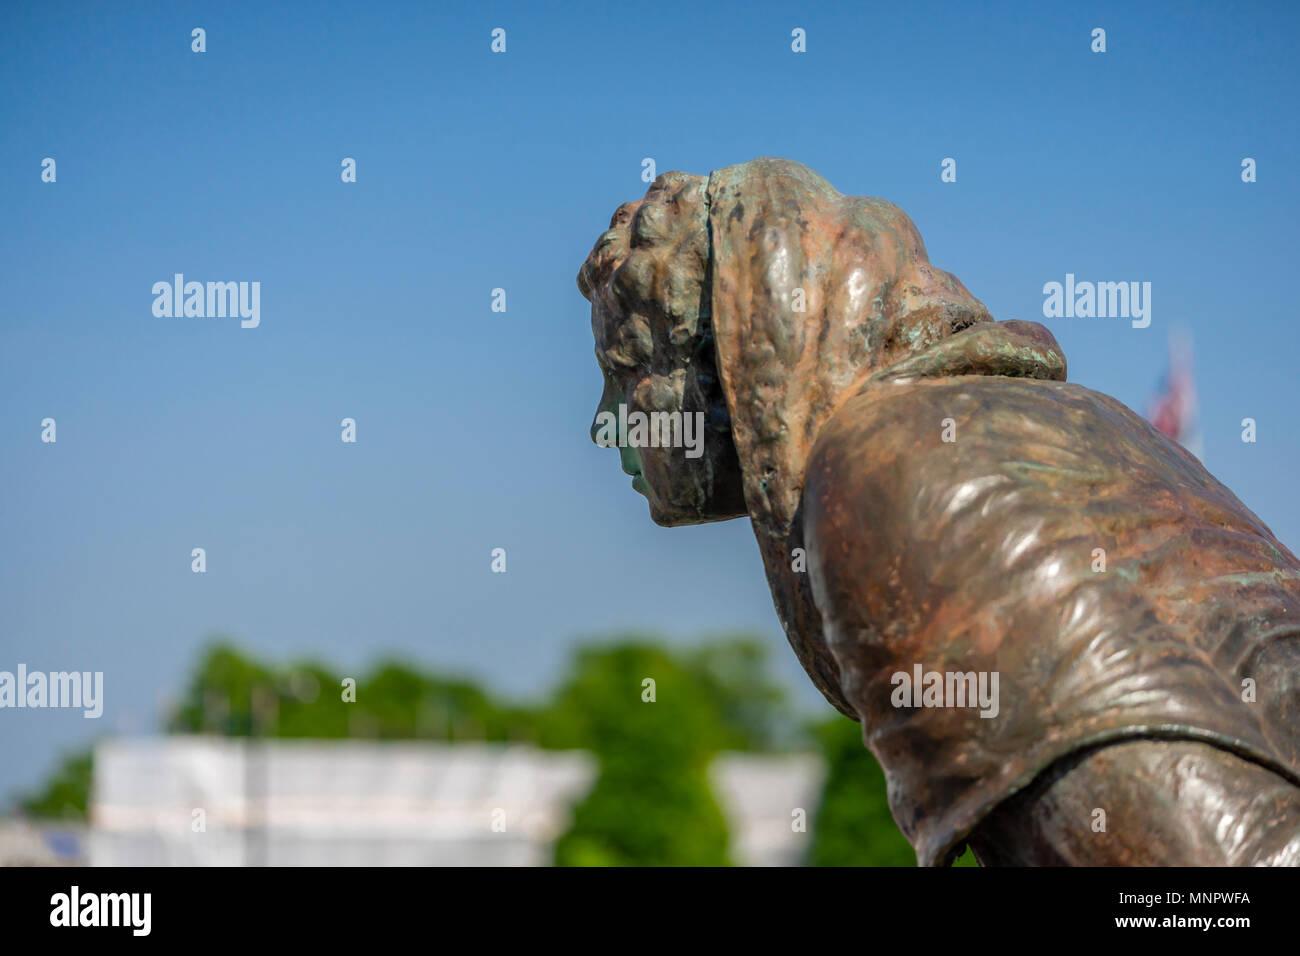 The bronze statue of John le Fleming, mayor of Southampton in the 14th century, Southampton, Hampshire, England Stock Photo